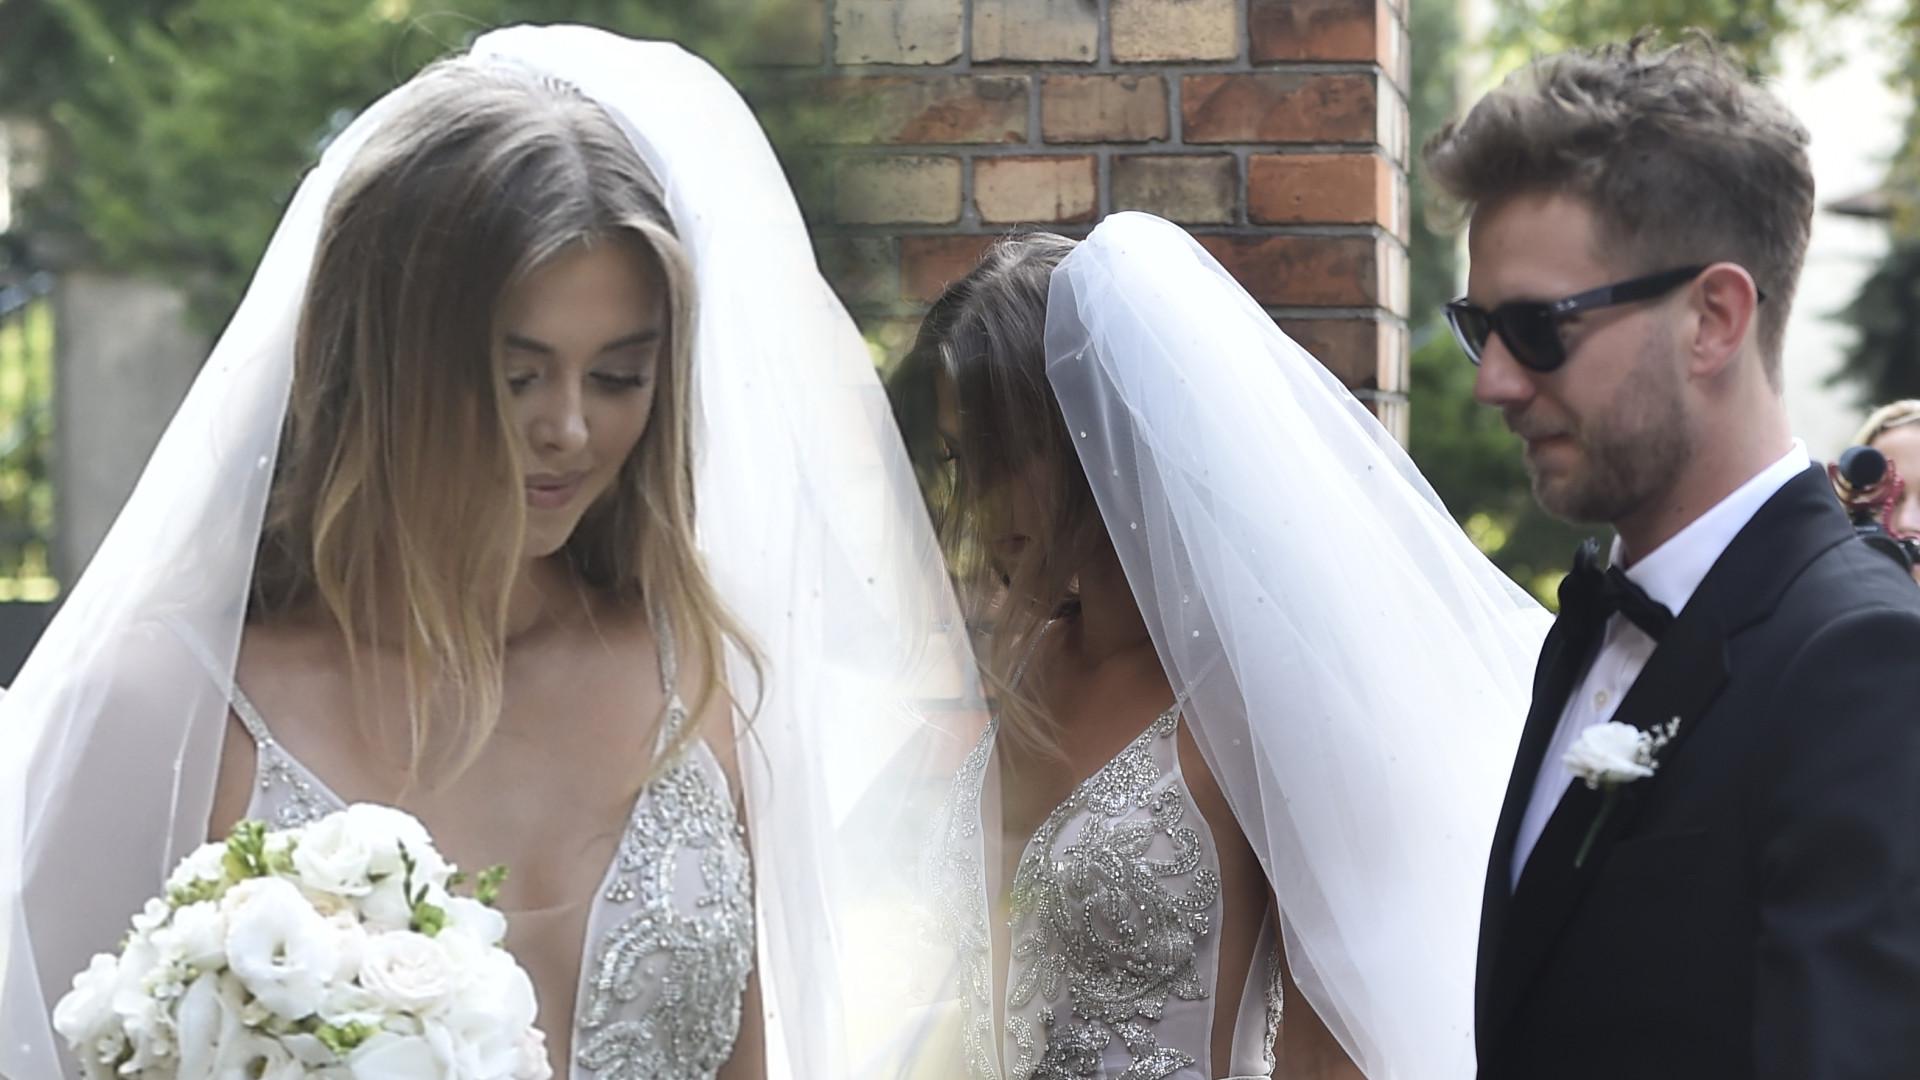 Joanna Opozda i Antek Królikowski biorą ŚLUB! Piękna suknia (ZDJĘCIA)